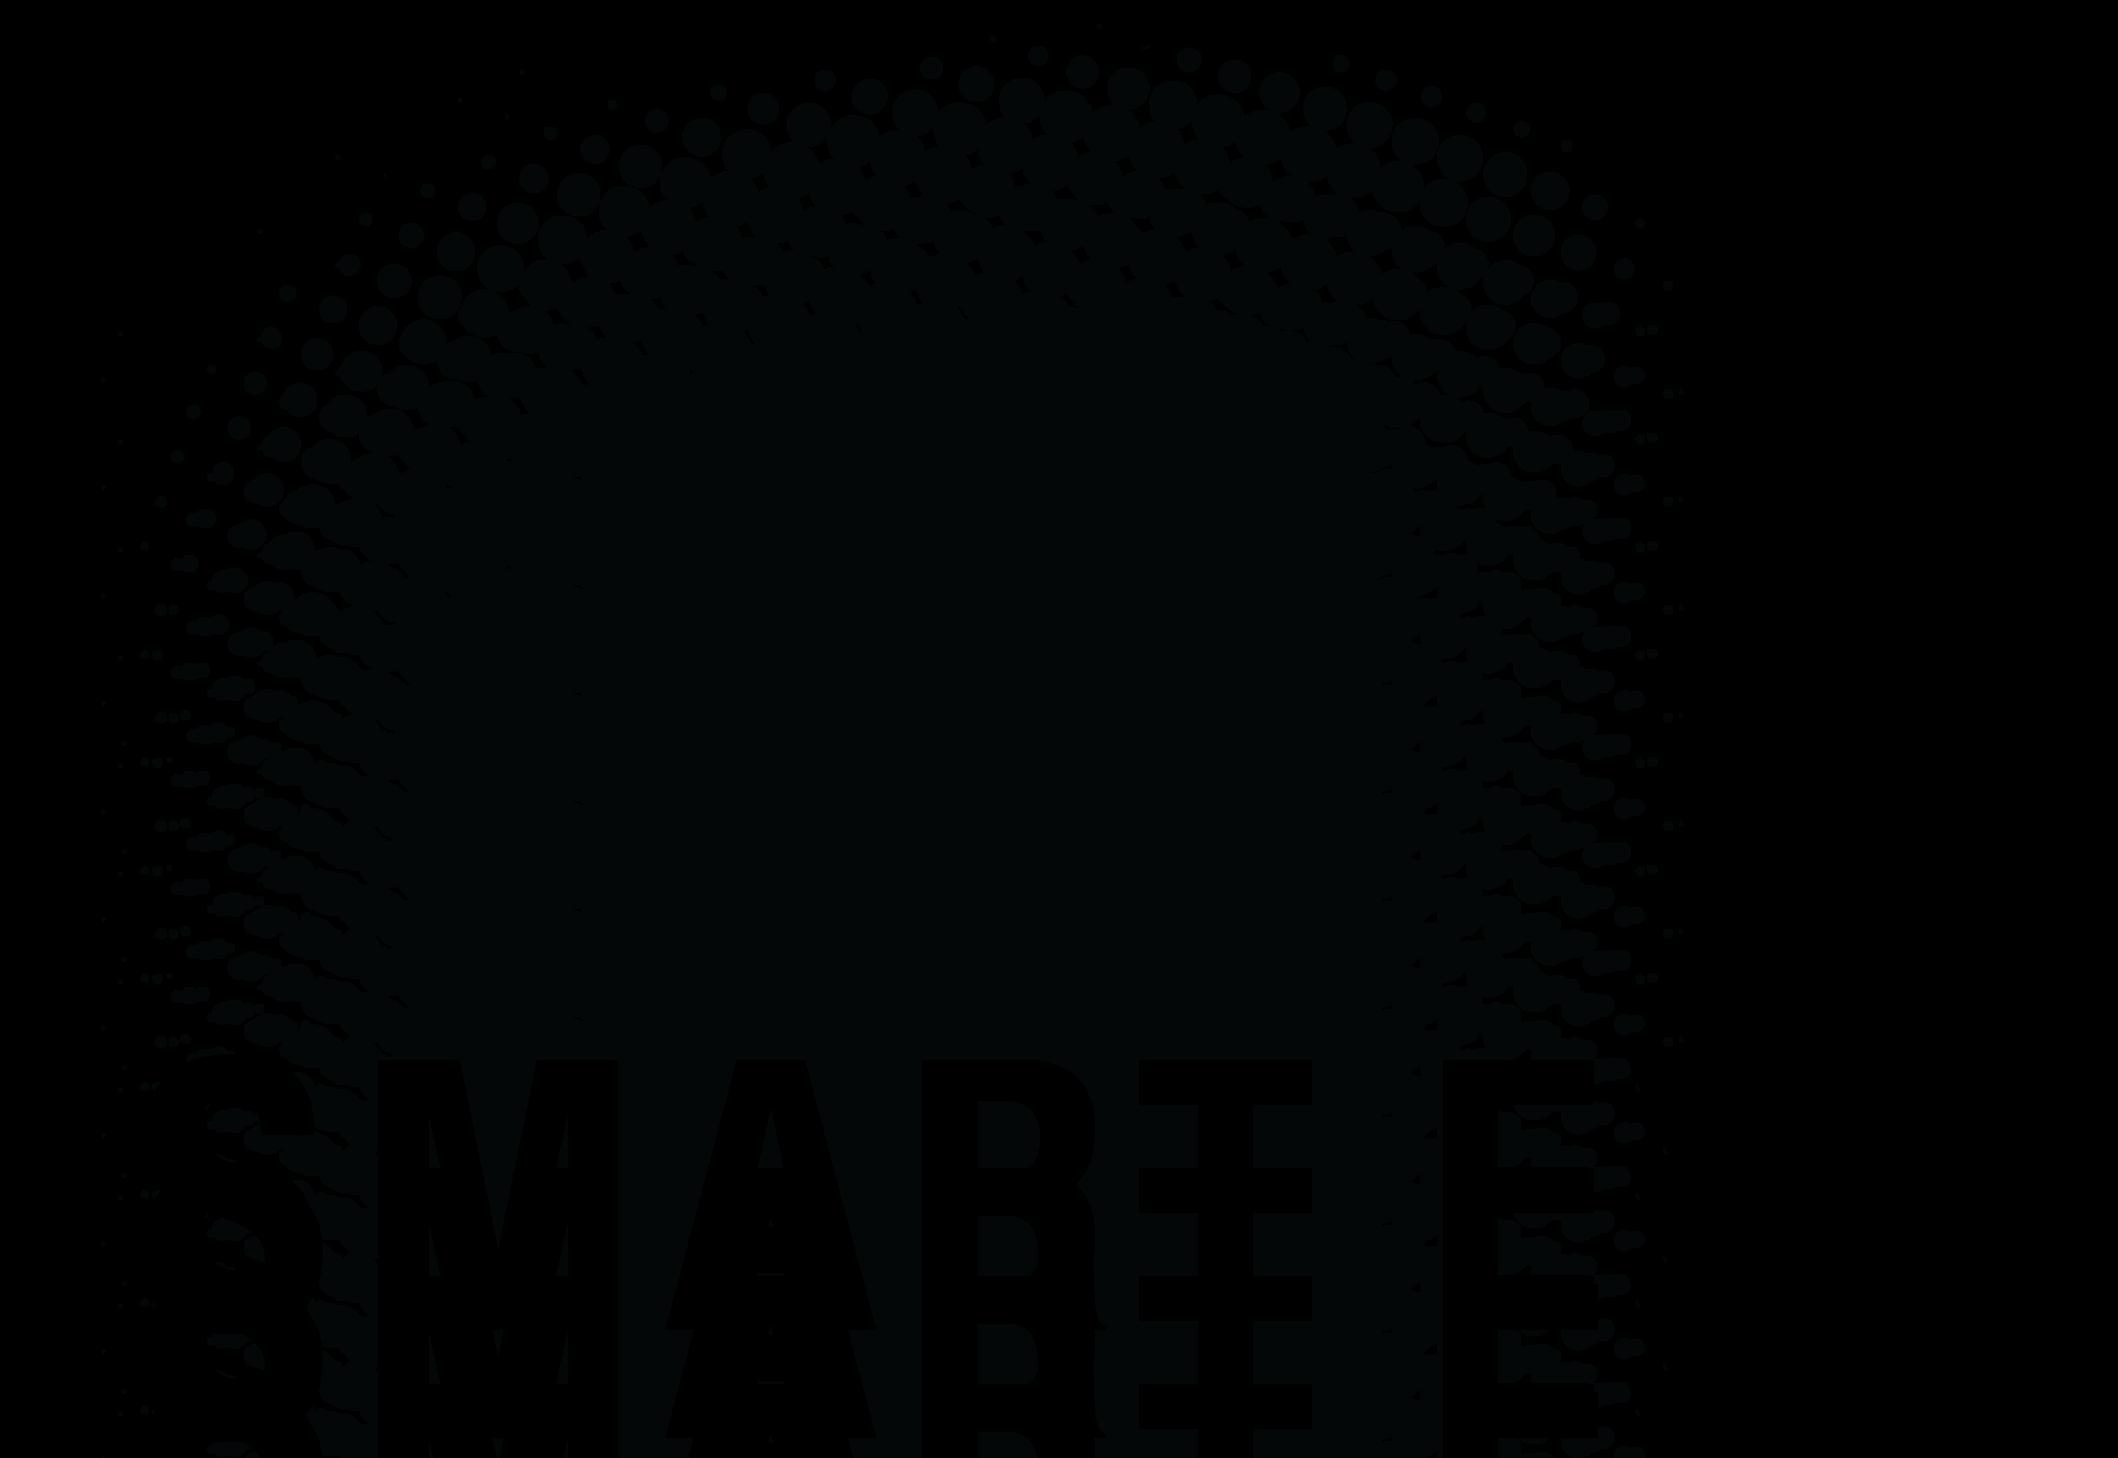 OGAMA (OpenGazeAndMouseAnalyzer): An open source software